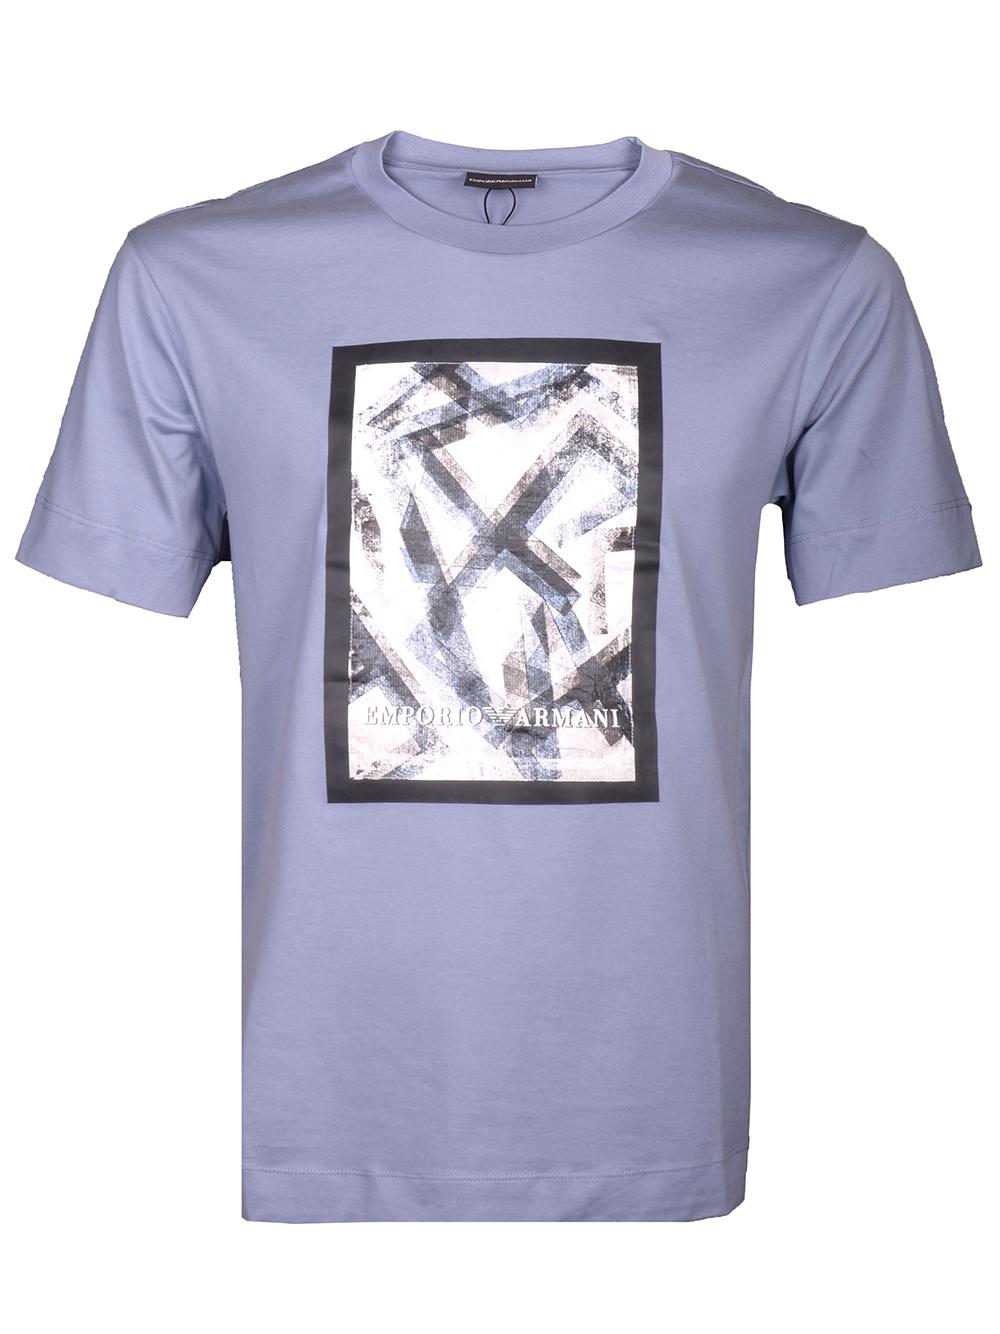 EMPORIO ARMANI Μπλούζα T-shirt 3H1TL0 1JCQZ-F715 ΓΚΡΙ